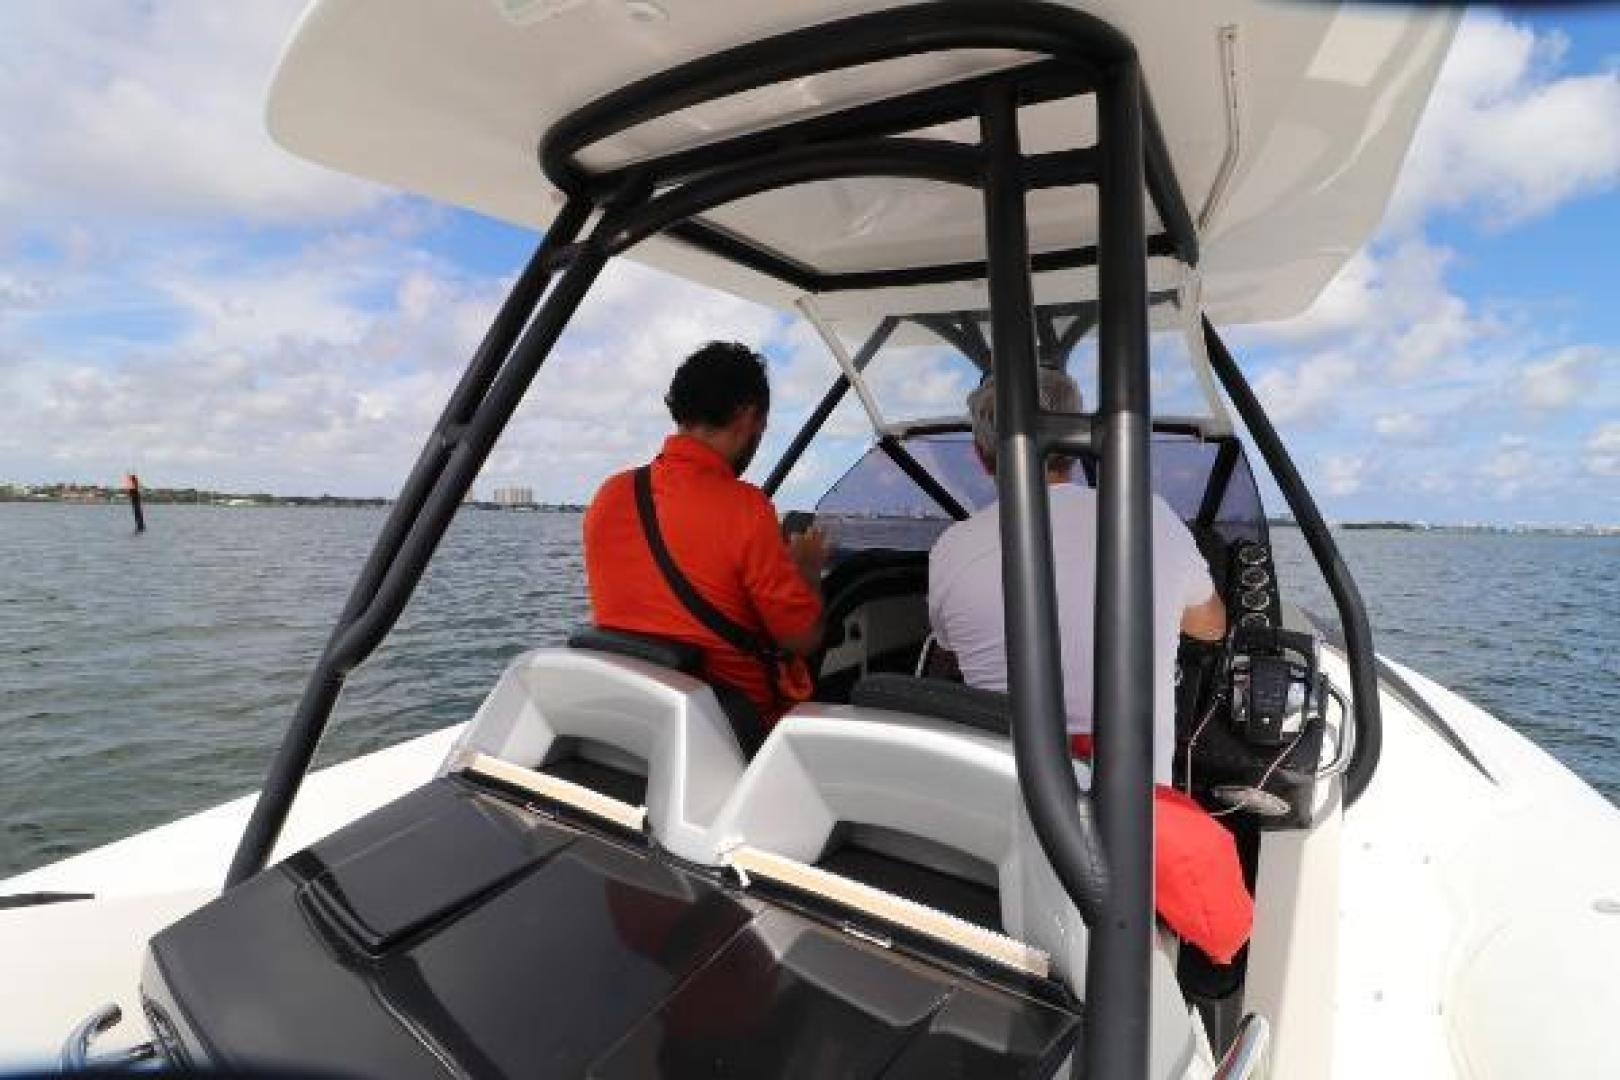 Sacs-Strider 40 ESSE R 2016-Sacs Strider 40 ESSE R Fort Lauderdale-Florida-United States-1533417   Thumbnail